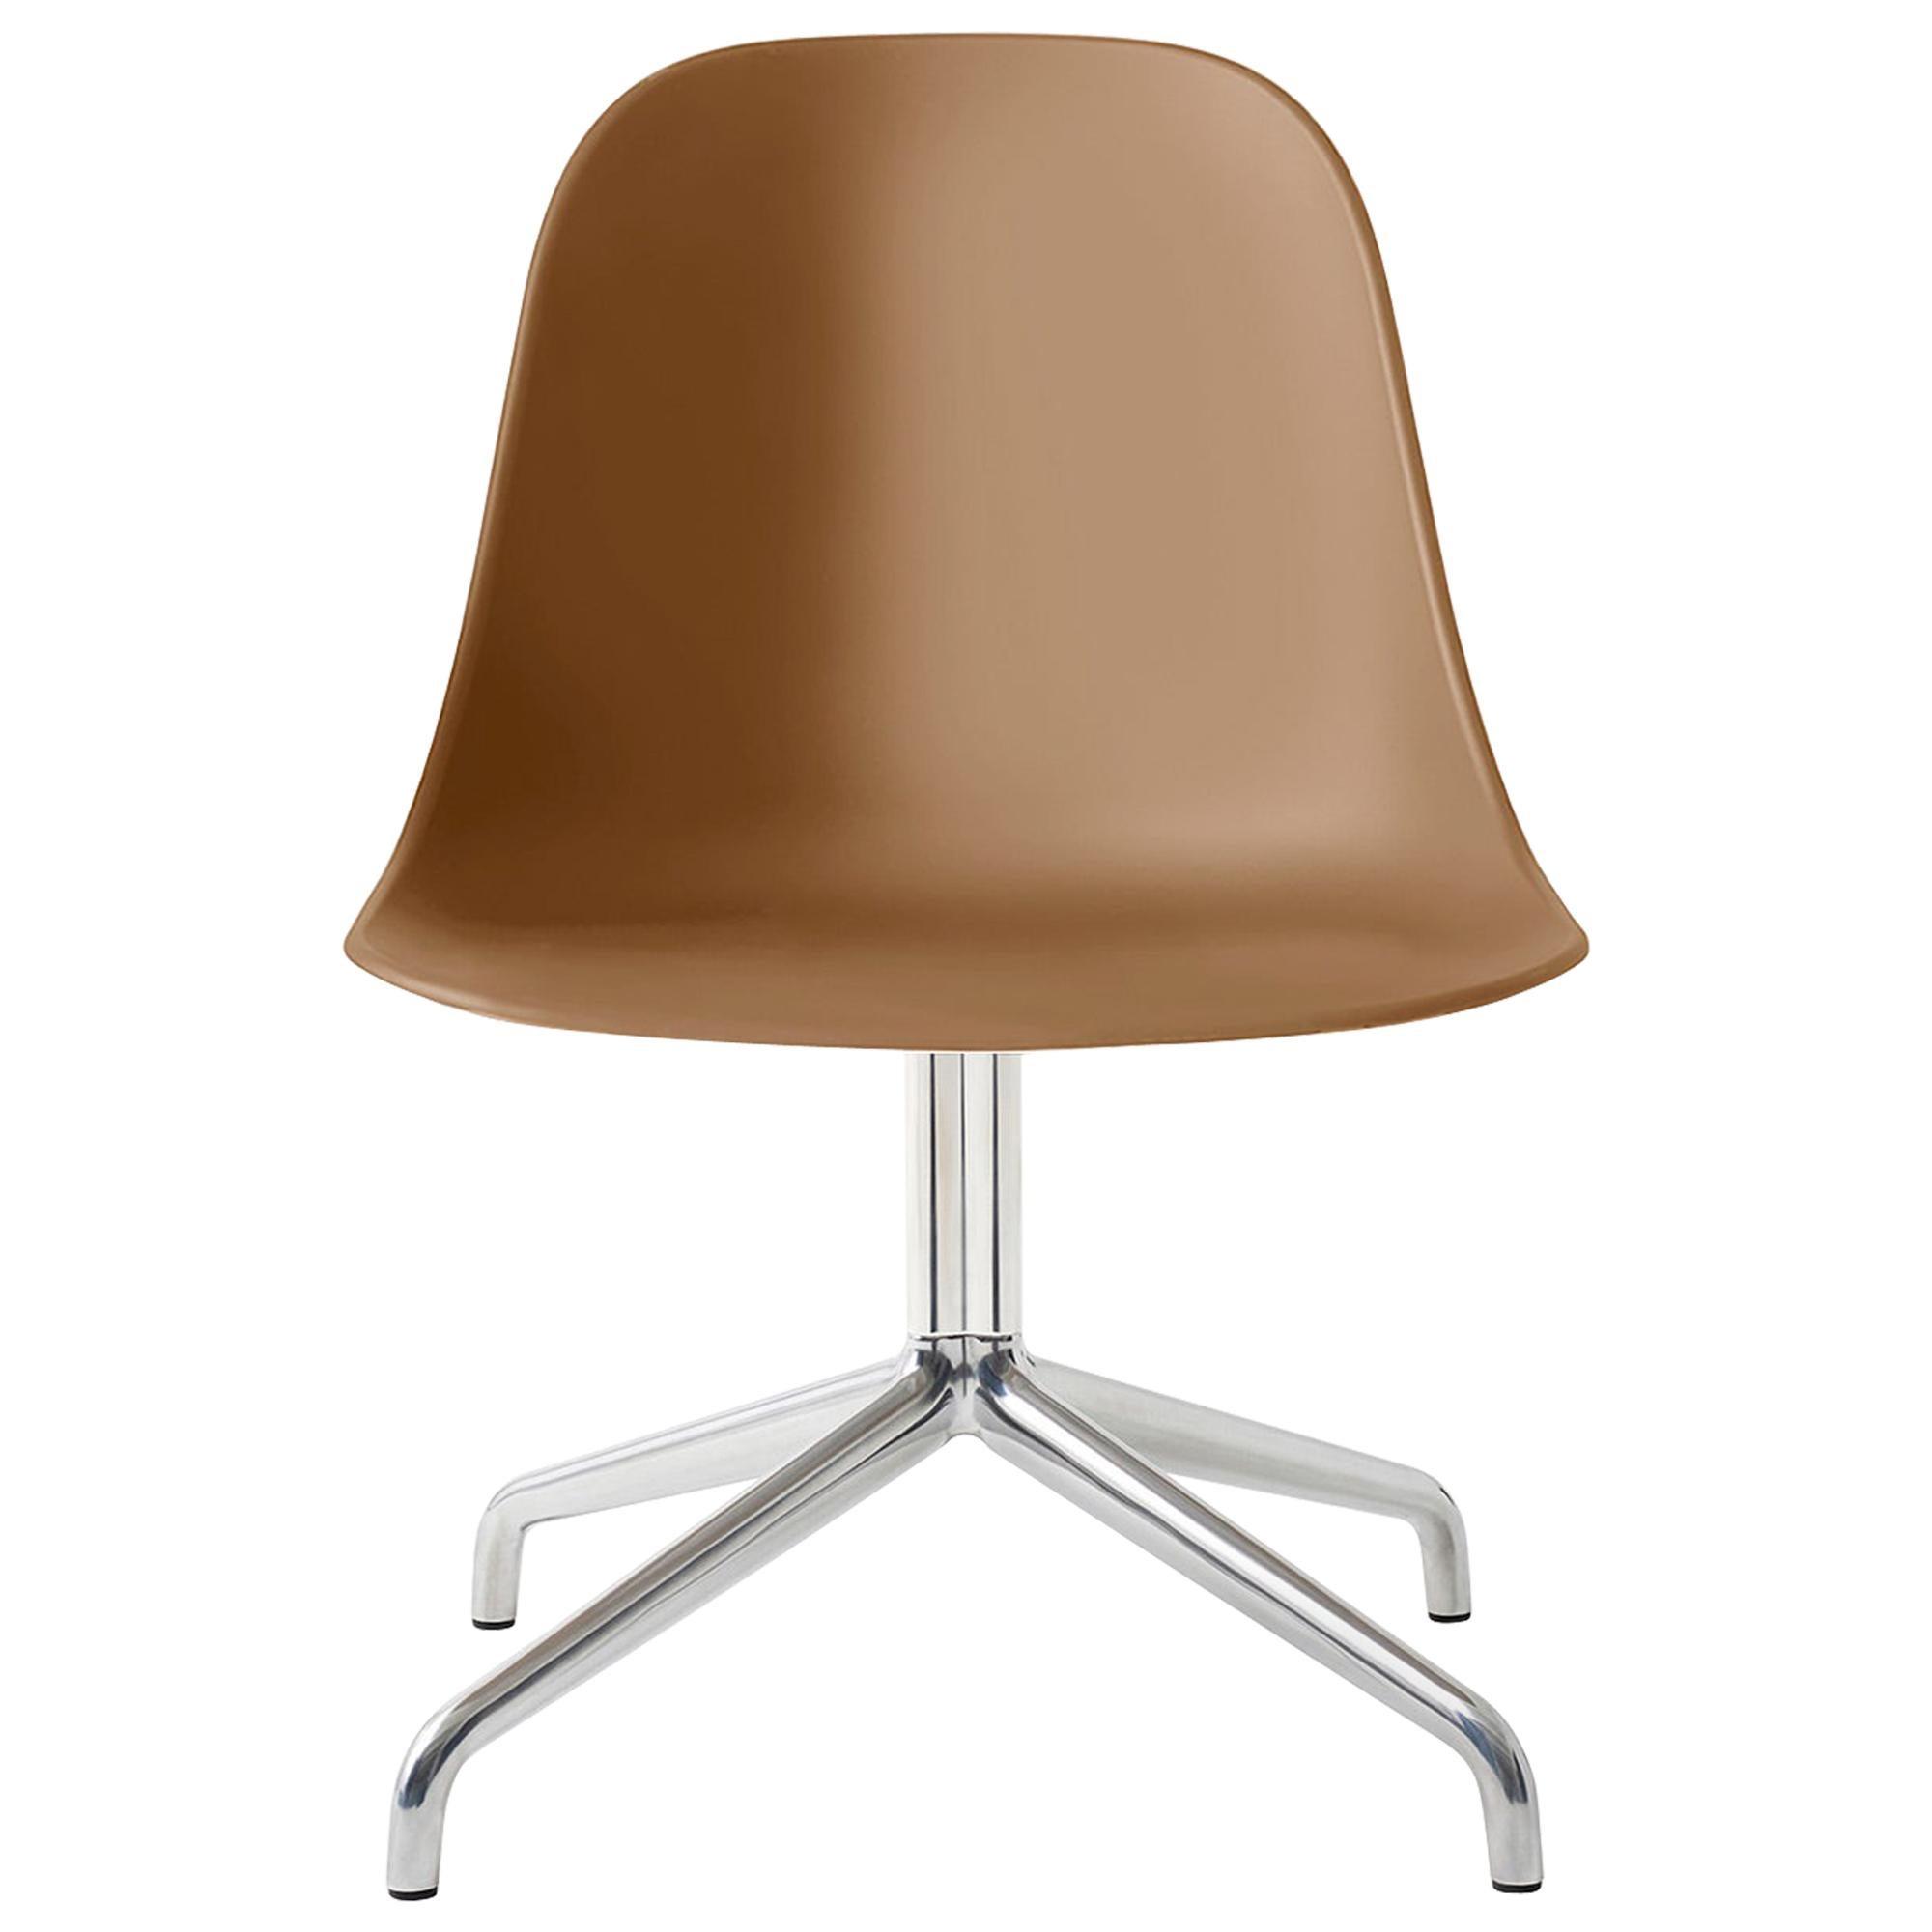 Cool Harbour Side Chair Polished Aluminum Swivel Base Grey City Velvet Creativecarmelina Interior Chair Design Creativecarmelinacom